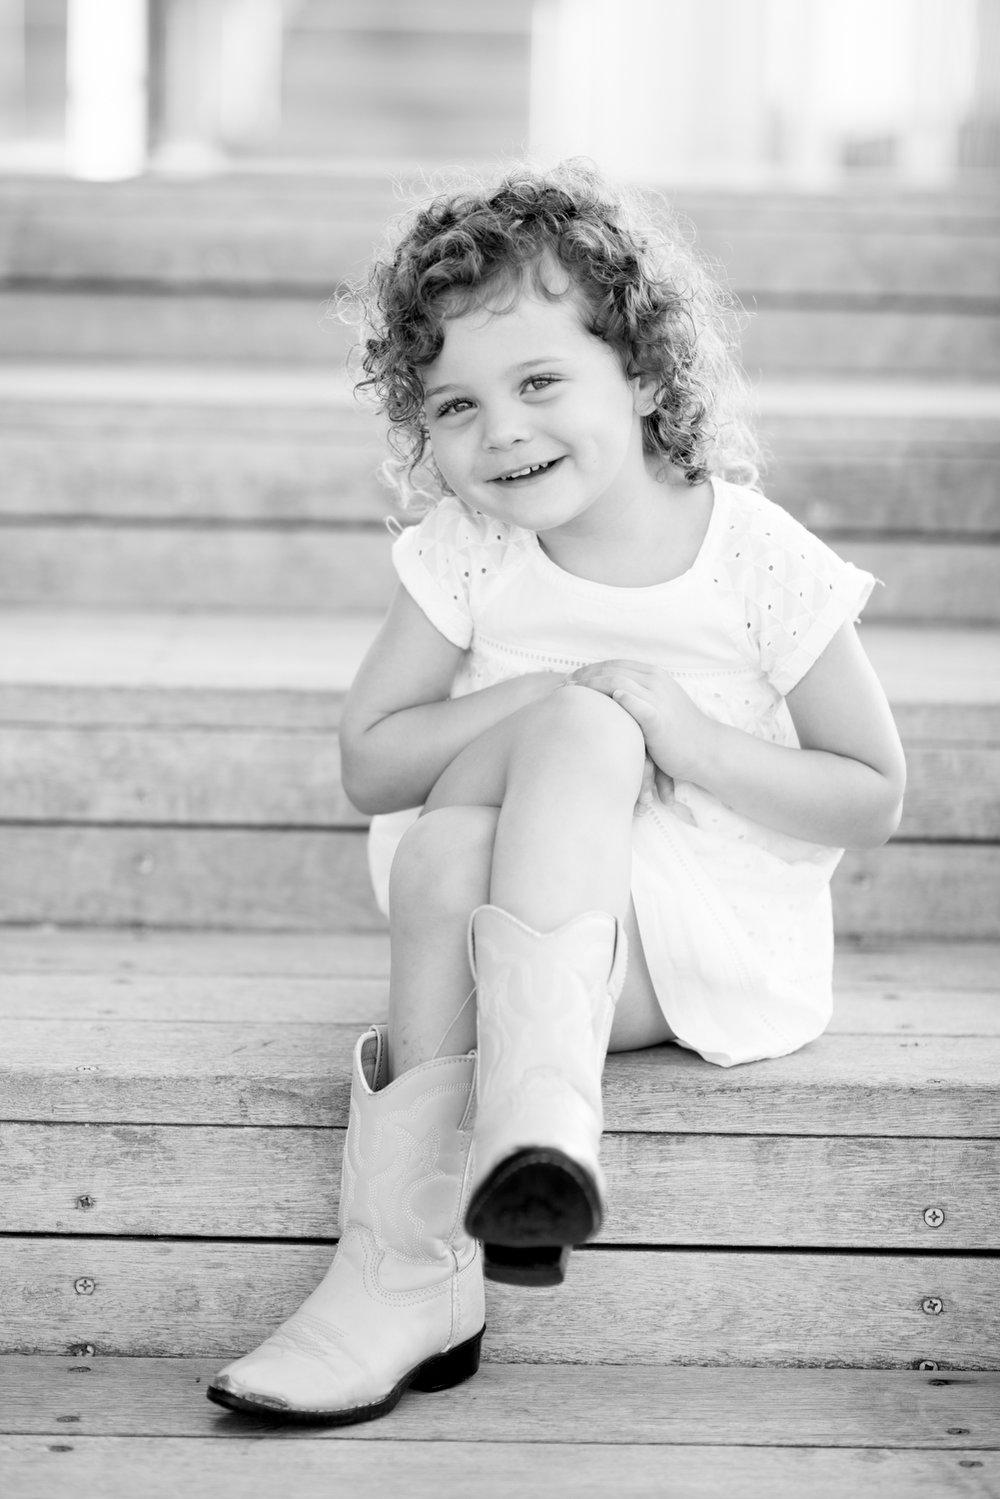 Maureen_Ford_Photography_Kids_0002.JPG